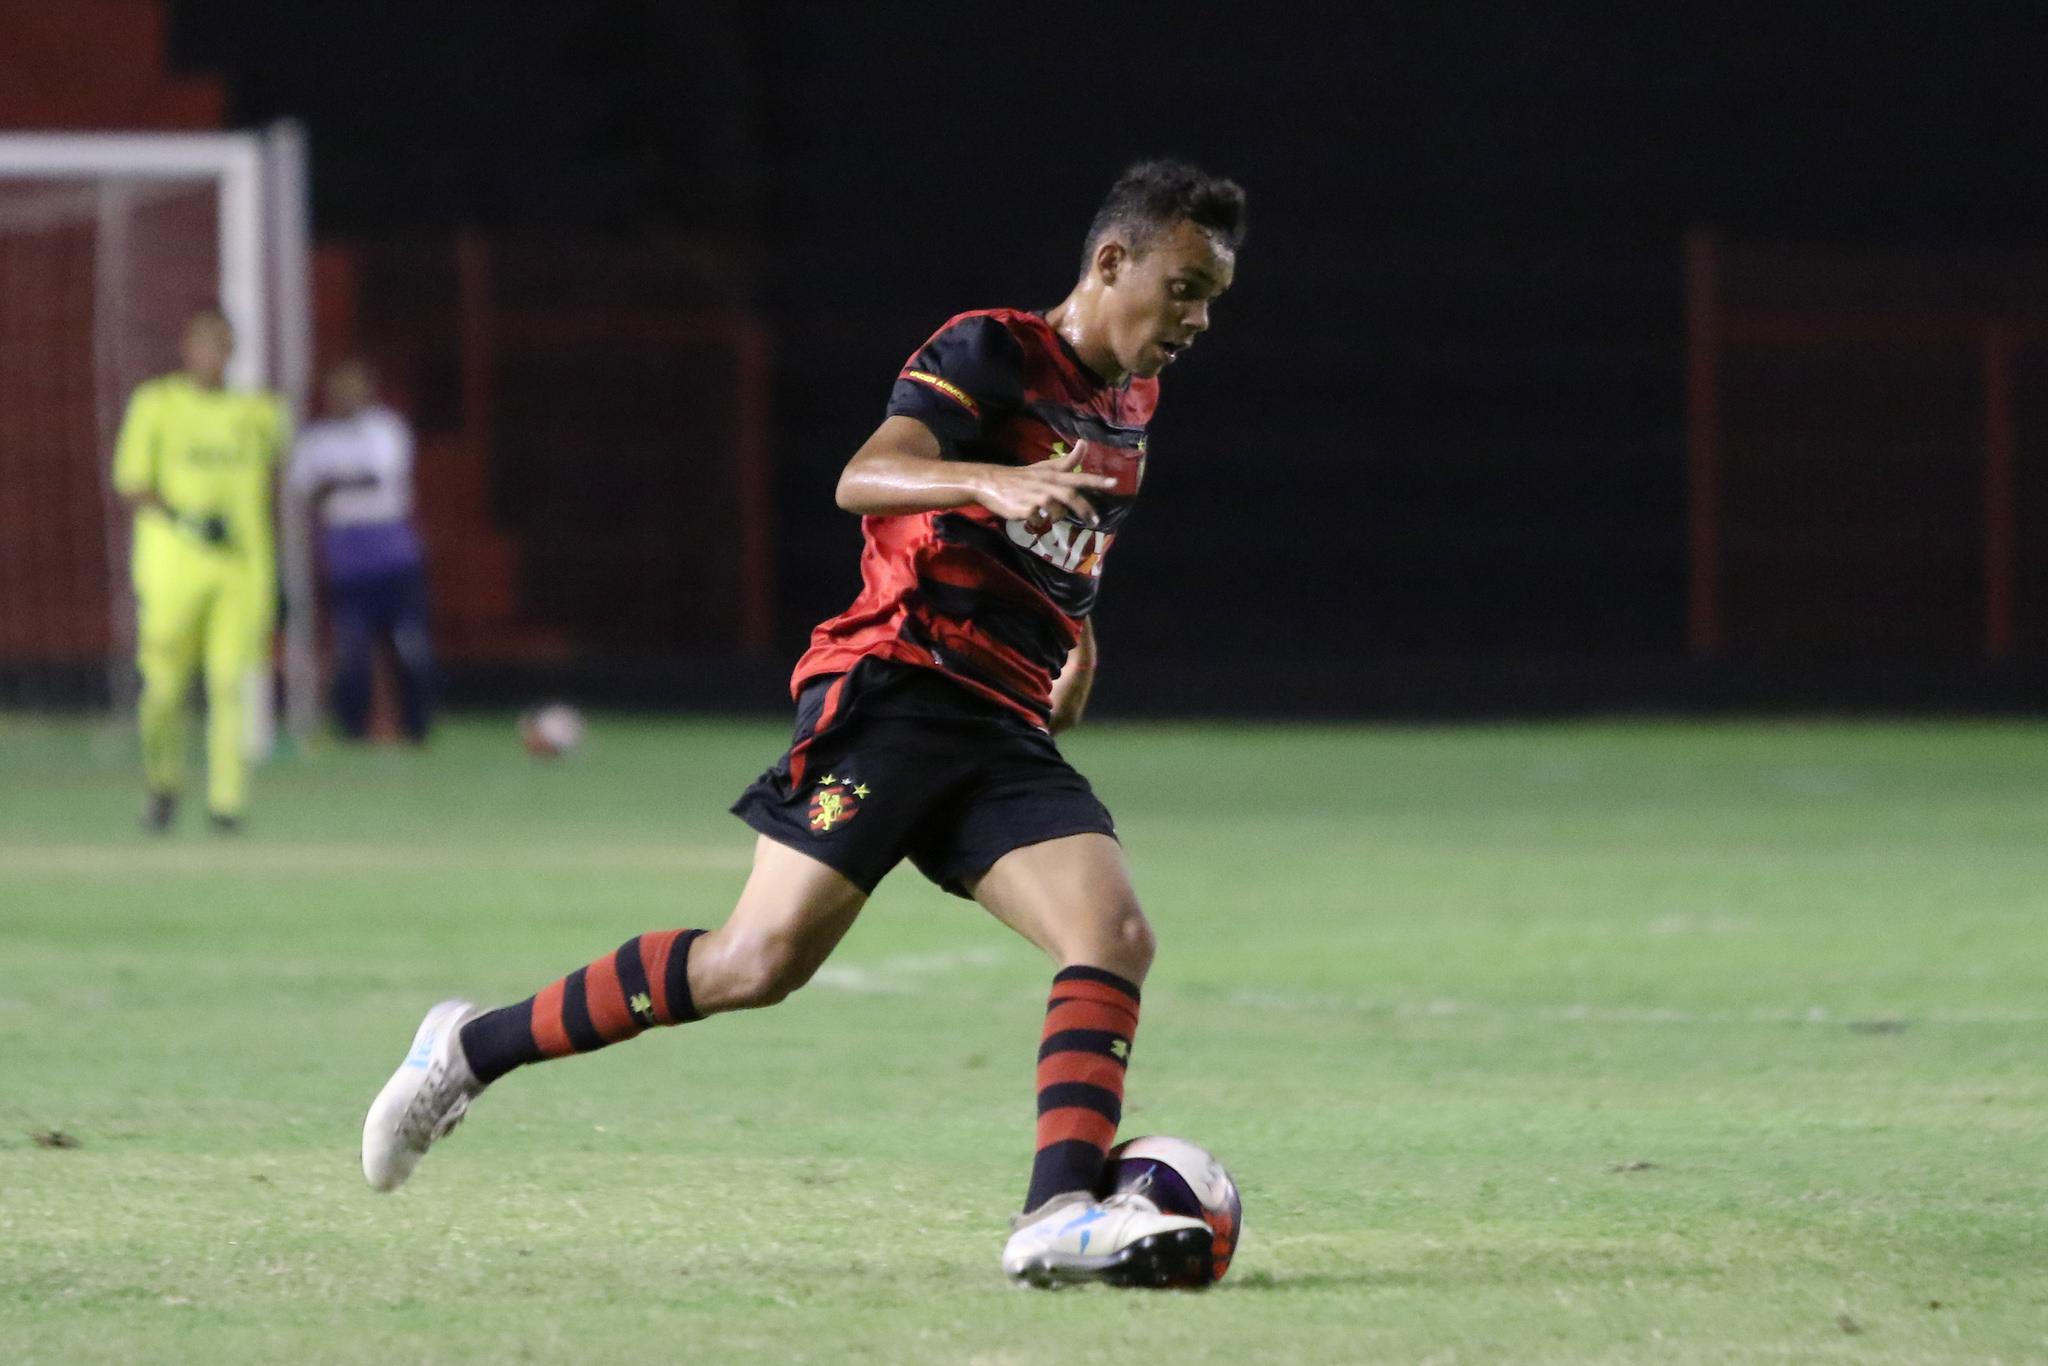 Copa Santiago: Sport vence Figueirense e já foca no Liverpool